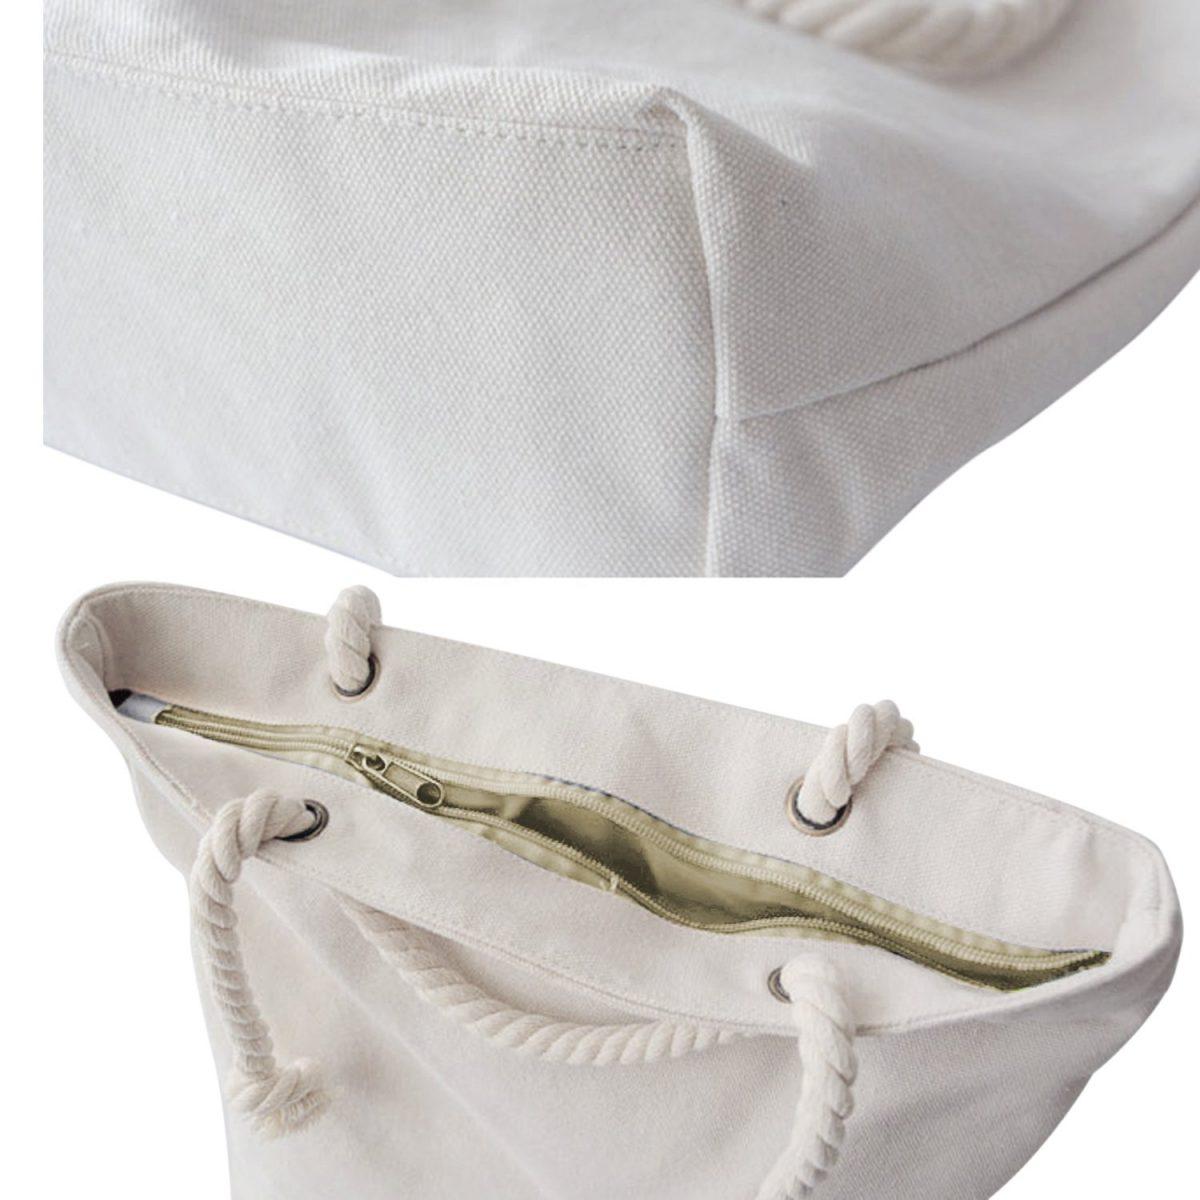 Puanlı Pudra Renkler Özel Tasarım Modern Fermuarlı Kumaş Çanta Realhomes